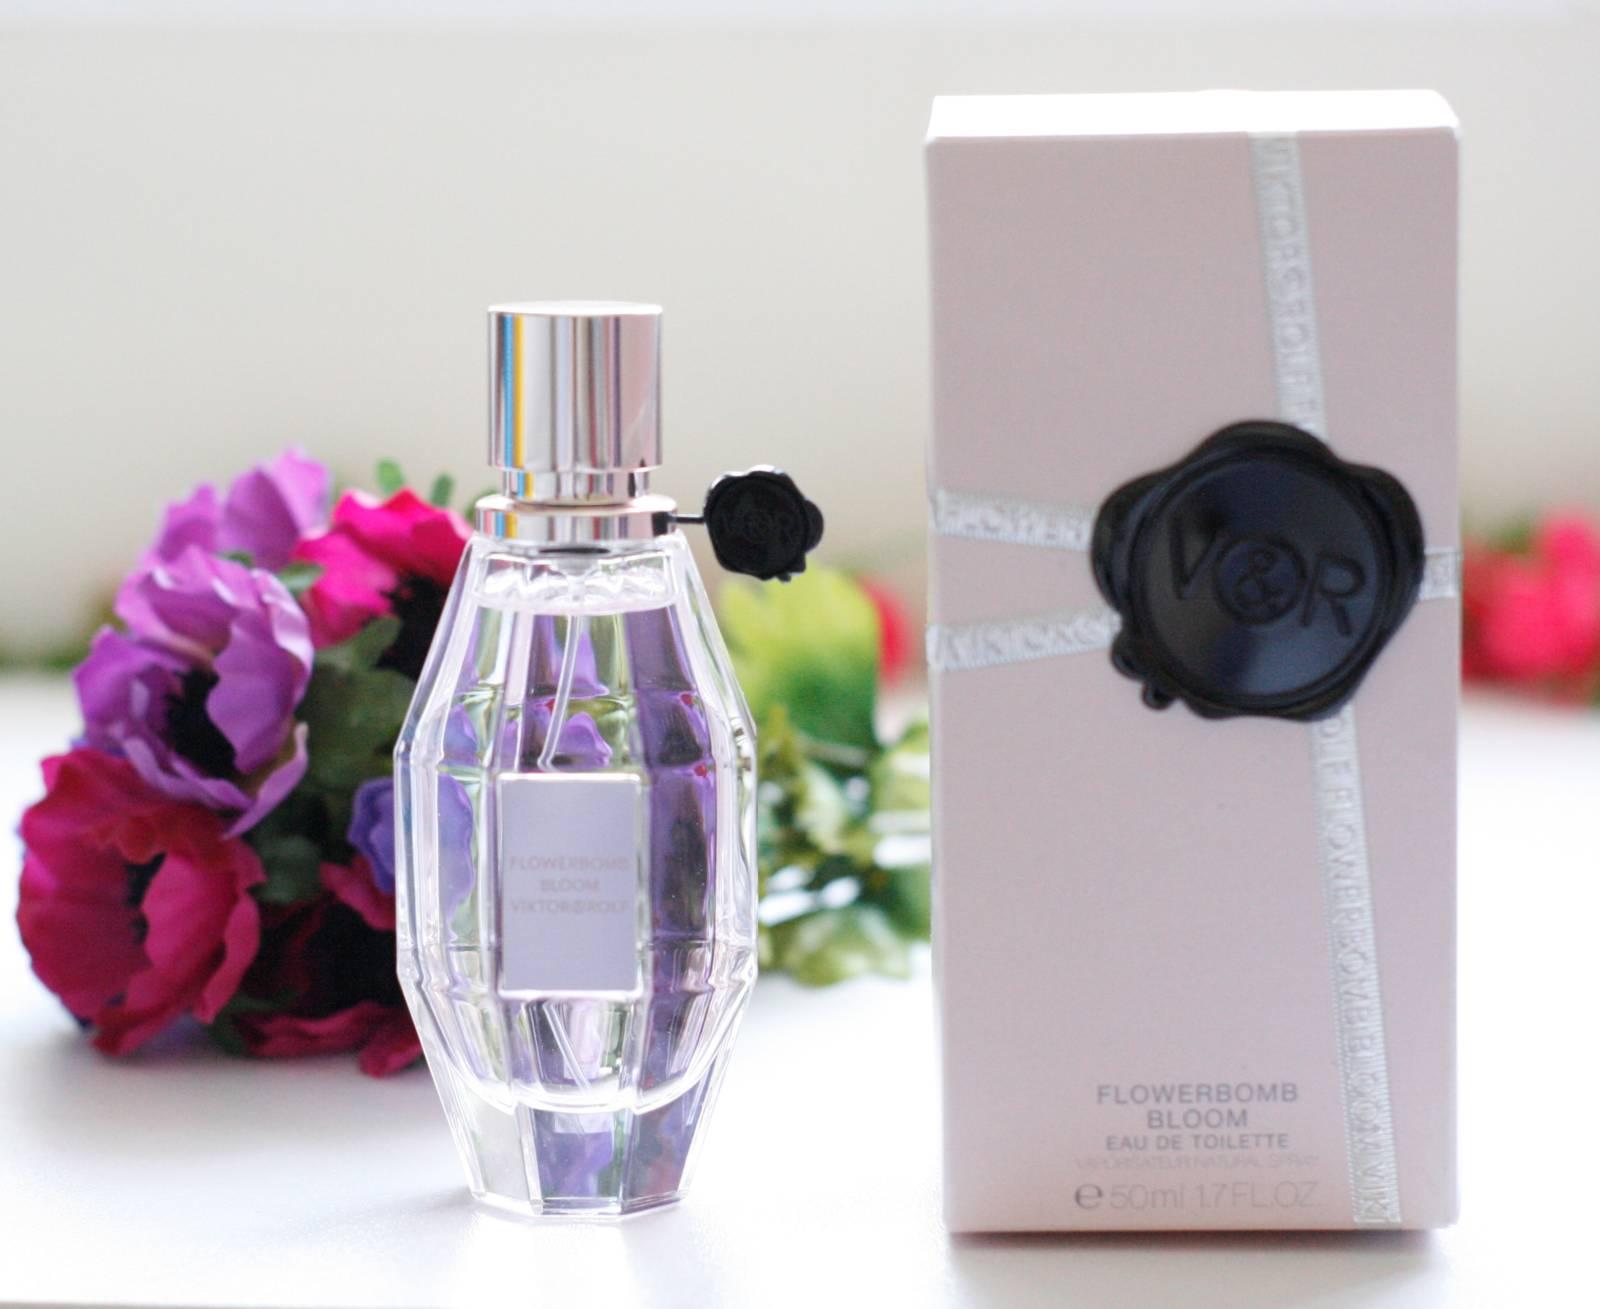 Viktor & Rolf Flower Bloom Review Beauty Geek UK